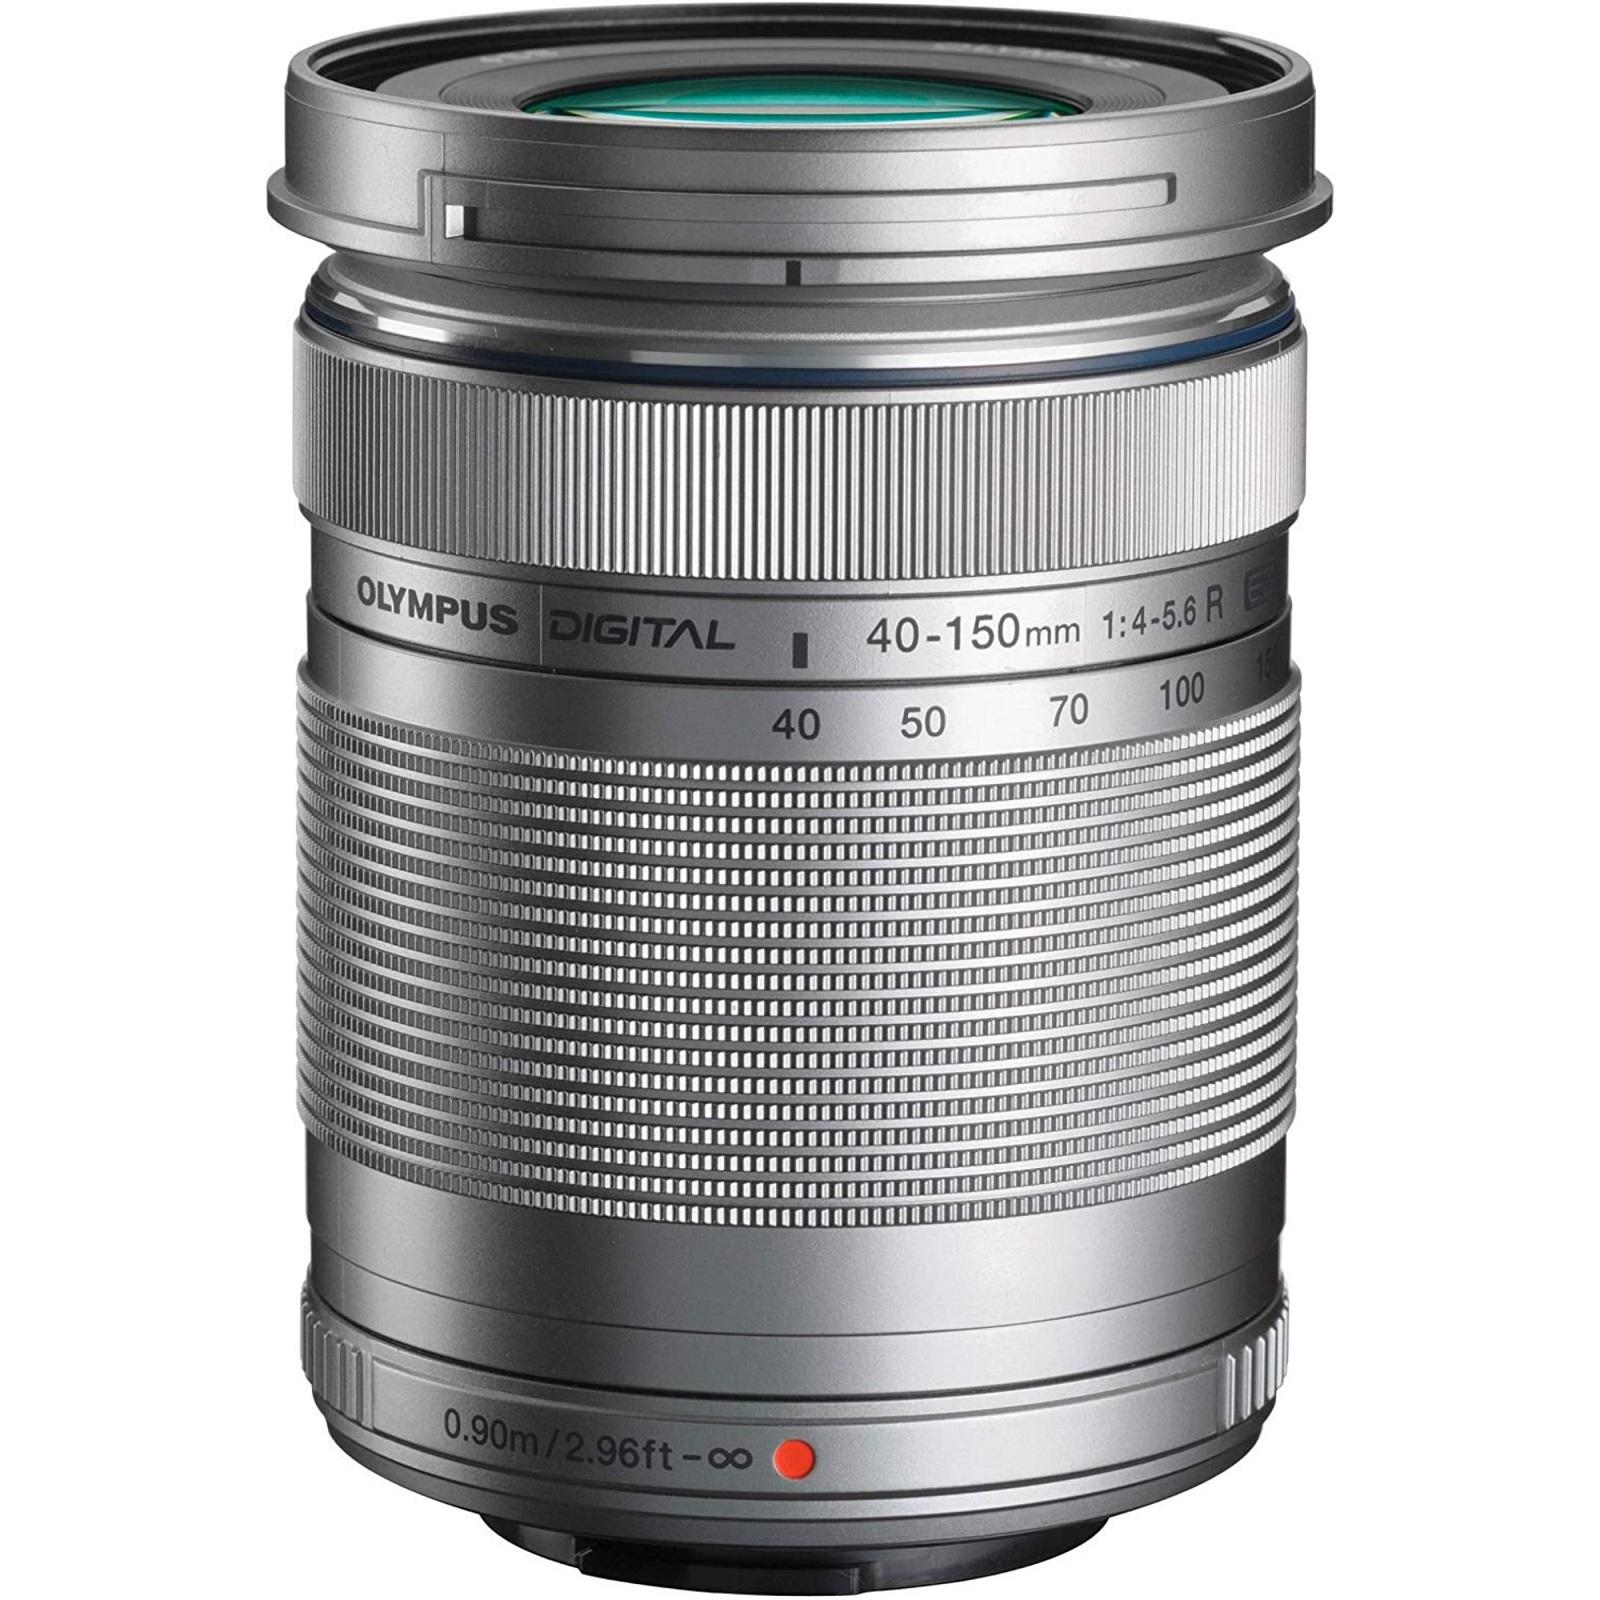 OLYMPUS オリンパス 望遠ズームレンズ M.ZUIKO DIGITAL ED 40-150mm F4.0-5.6 R シルバー 新品 (簡易箱)